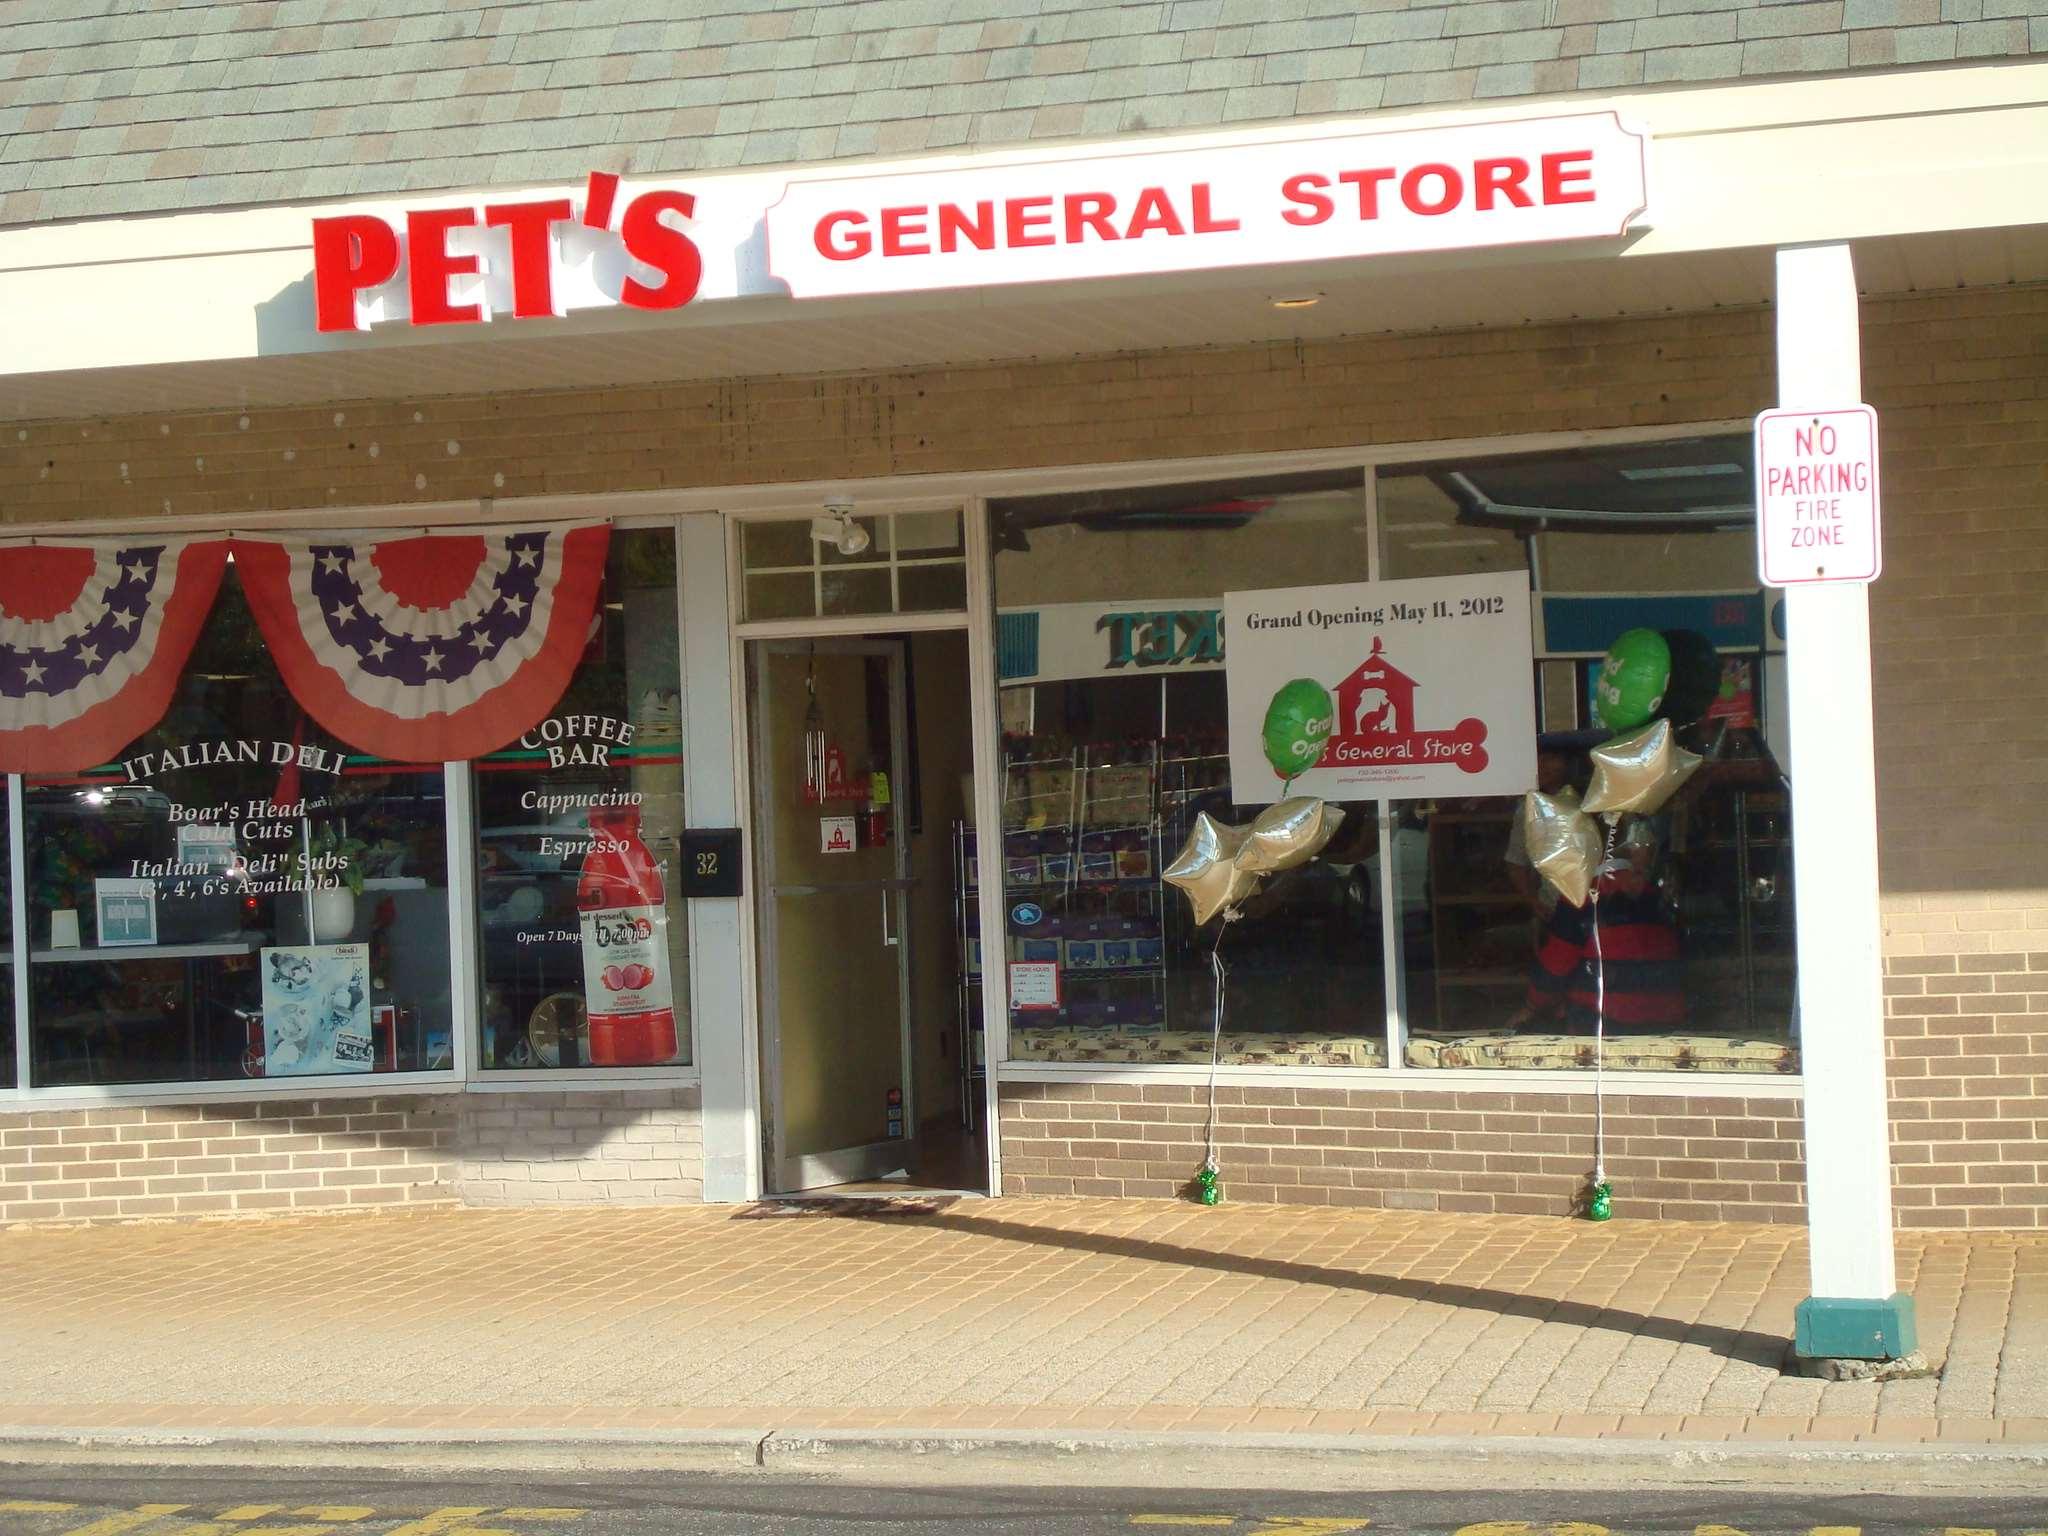 Pet's General Store